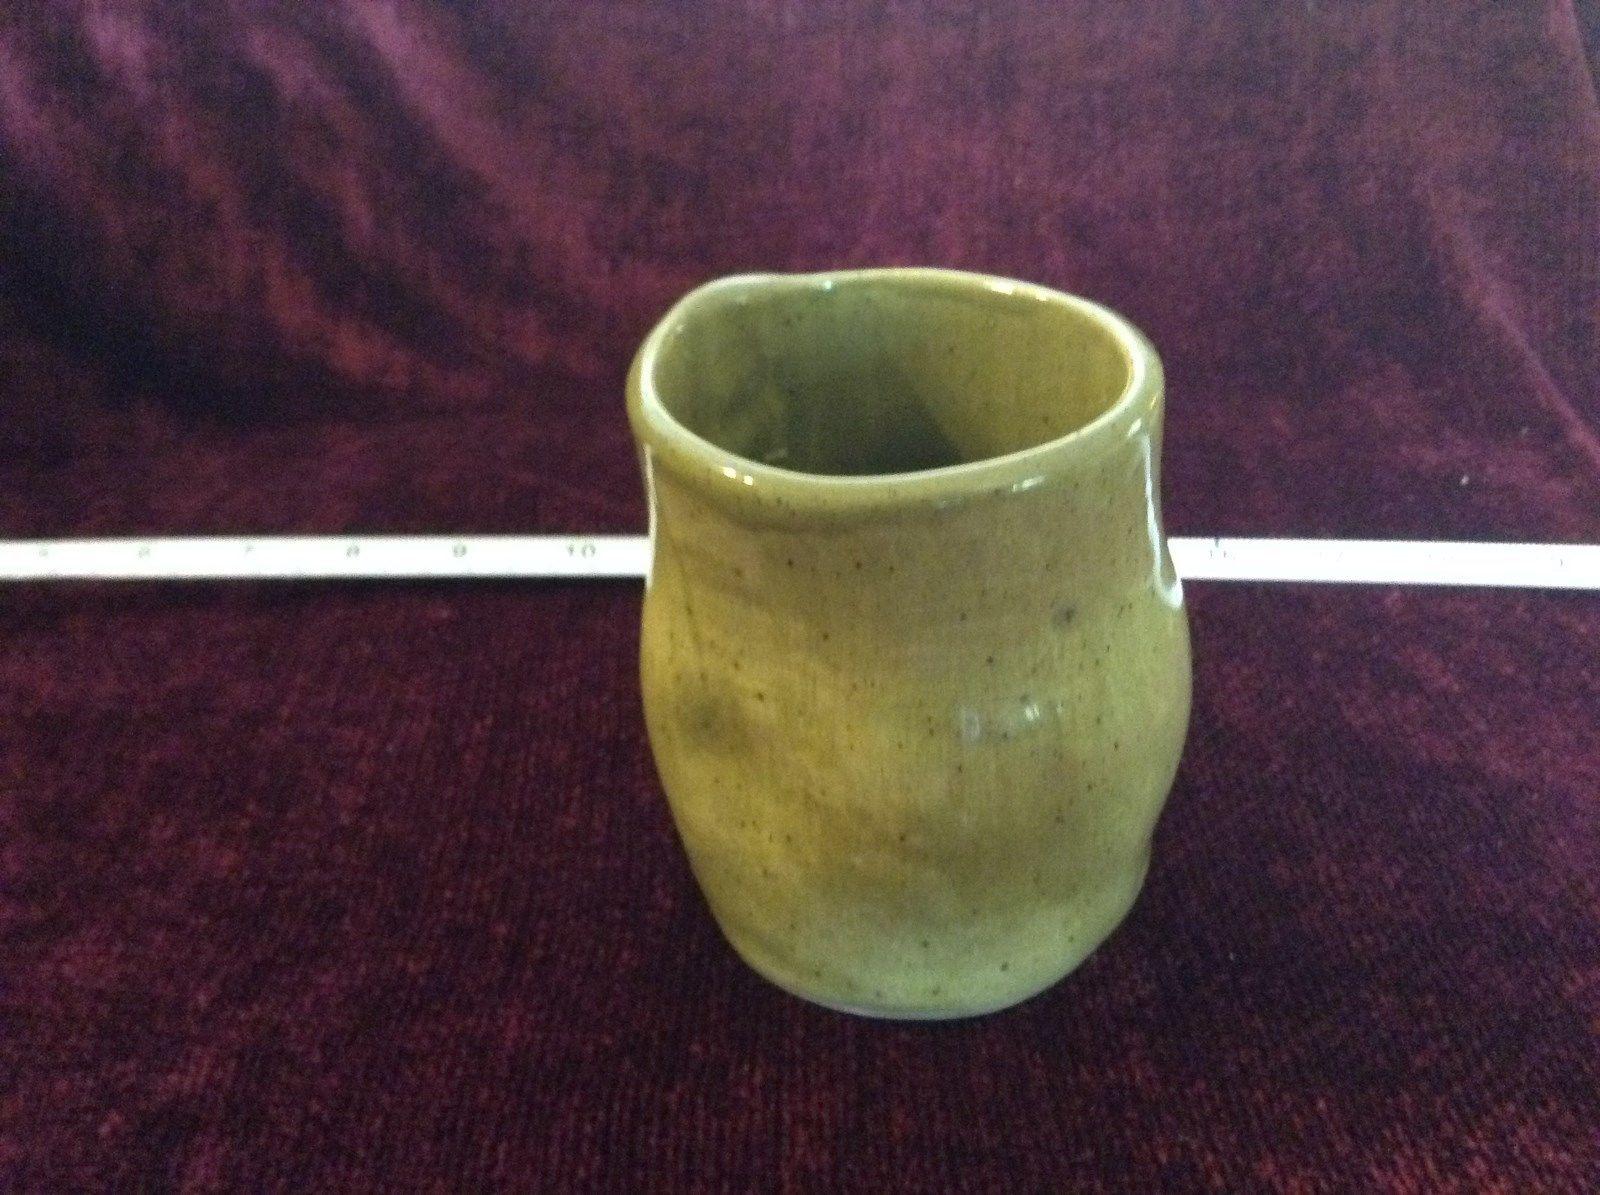 Small Green Ceramic 2012 Vase Designs on Bottom Base